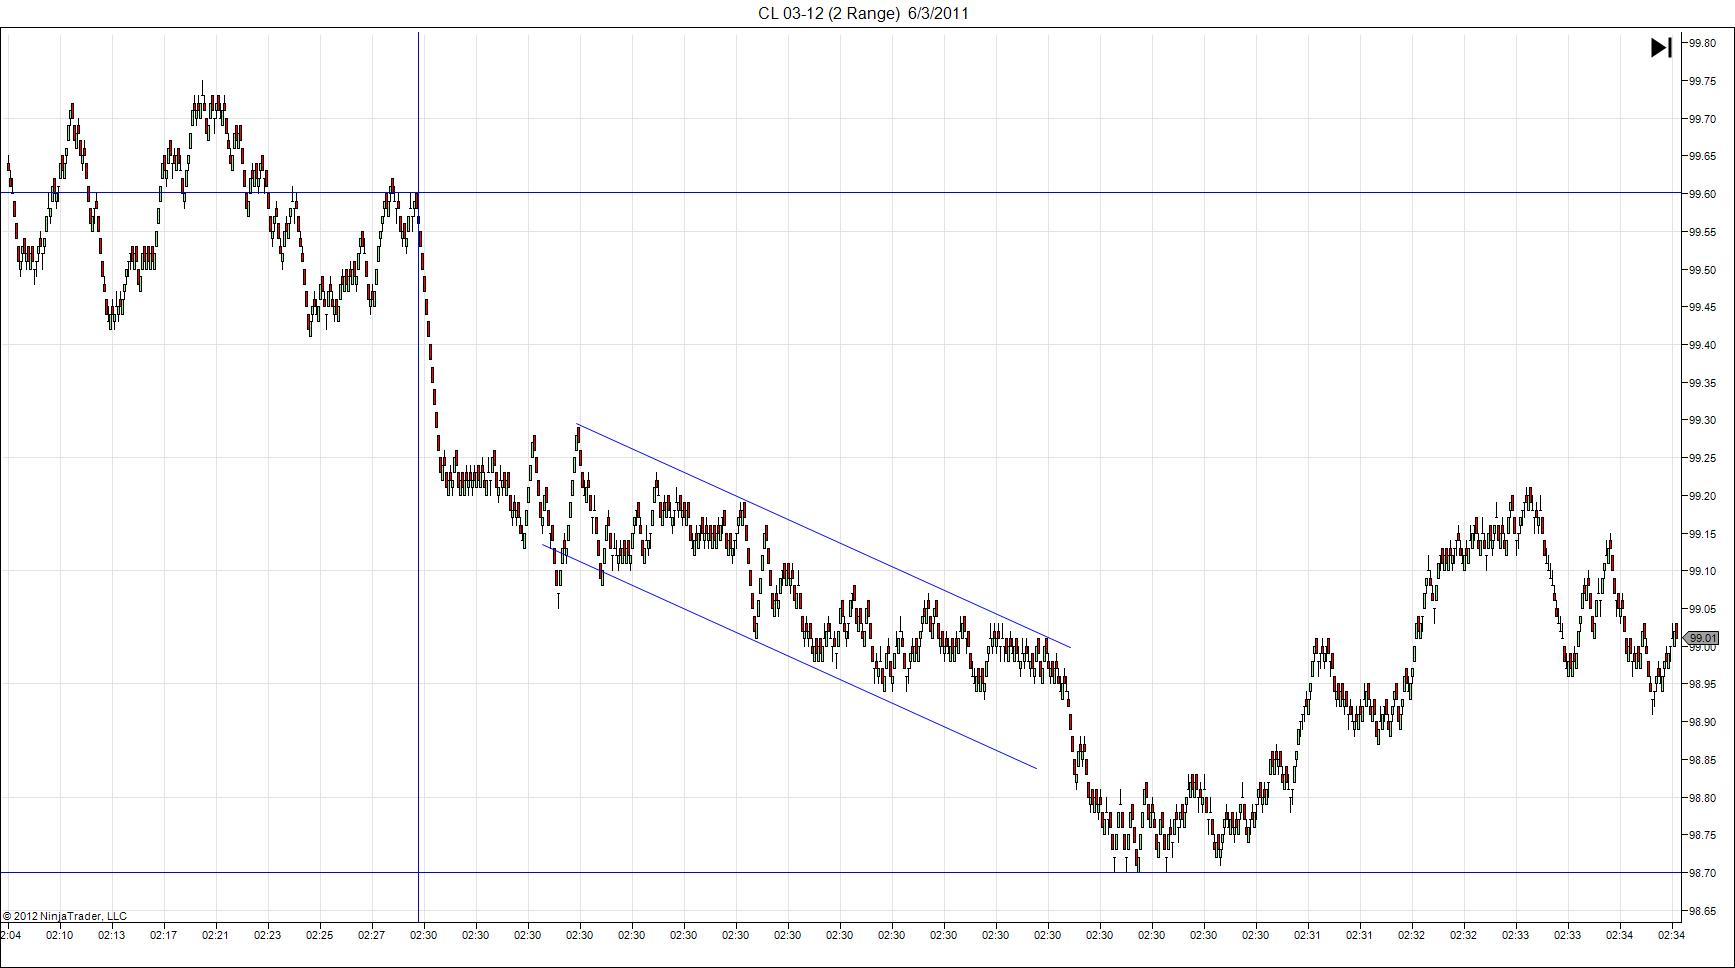 CL 03 12 (2 Range) 06.03.11